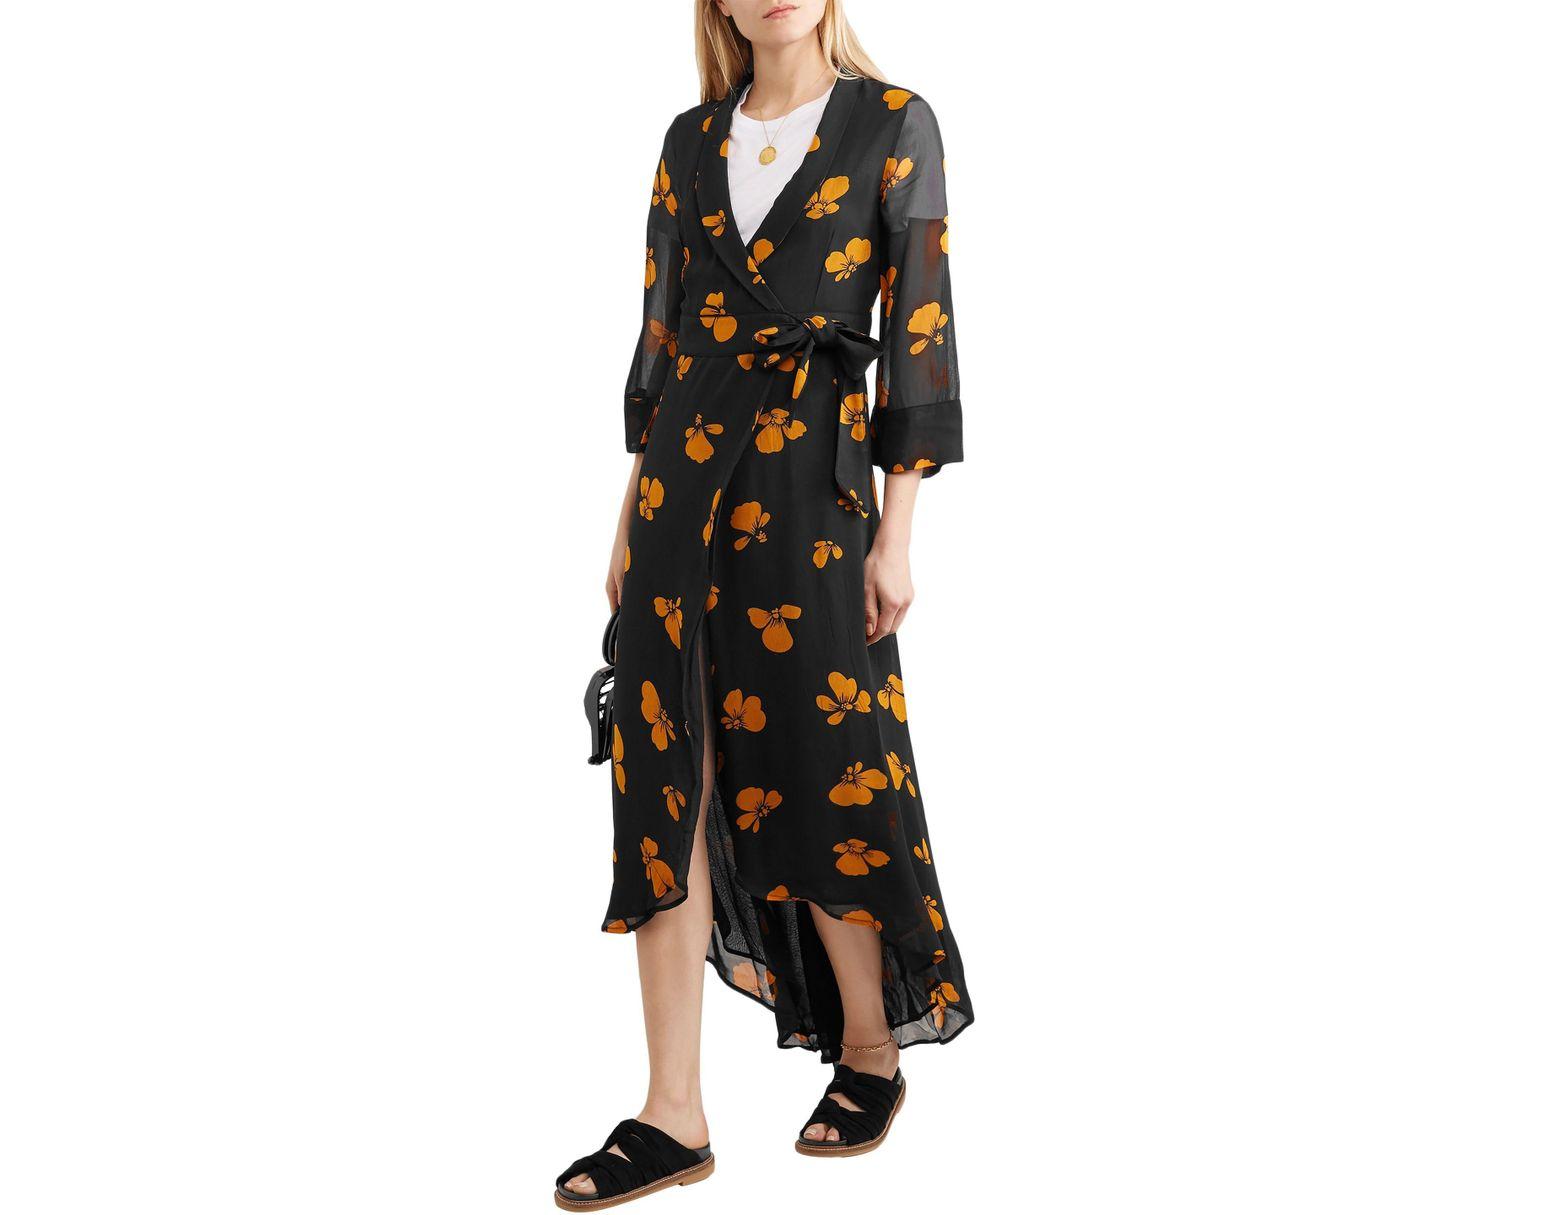 e4a58406 Ganni Woman Fairfax Floral-print Chiffon Wrap Dress Black in Black - Save 50%  - Lyst